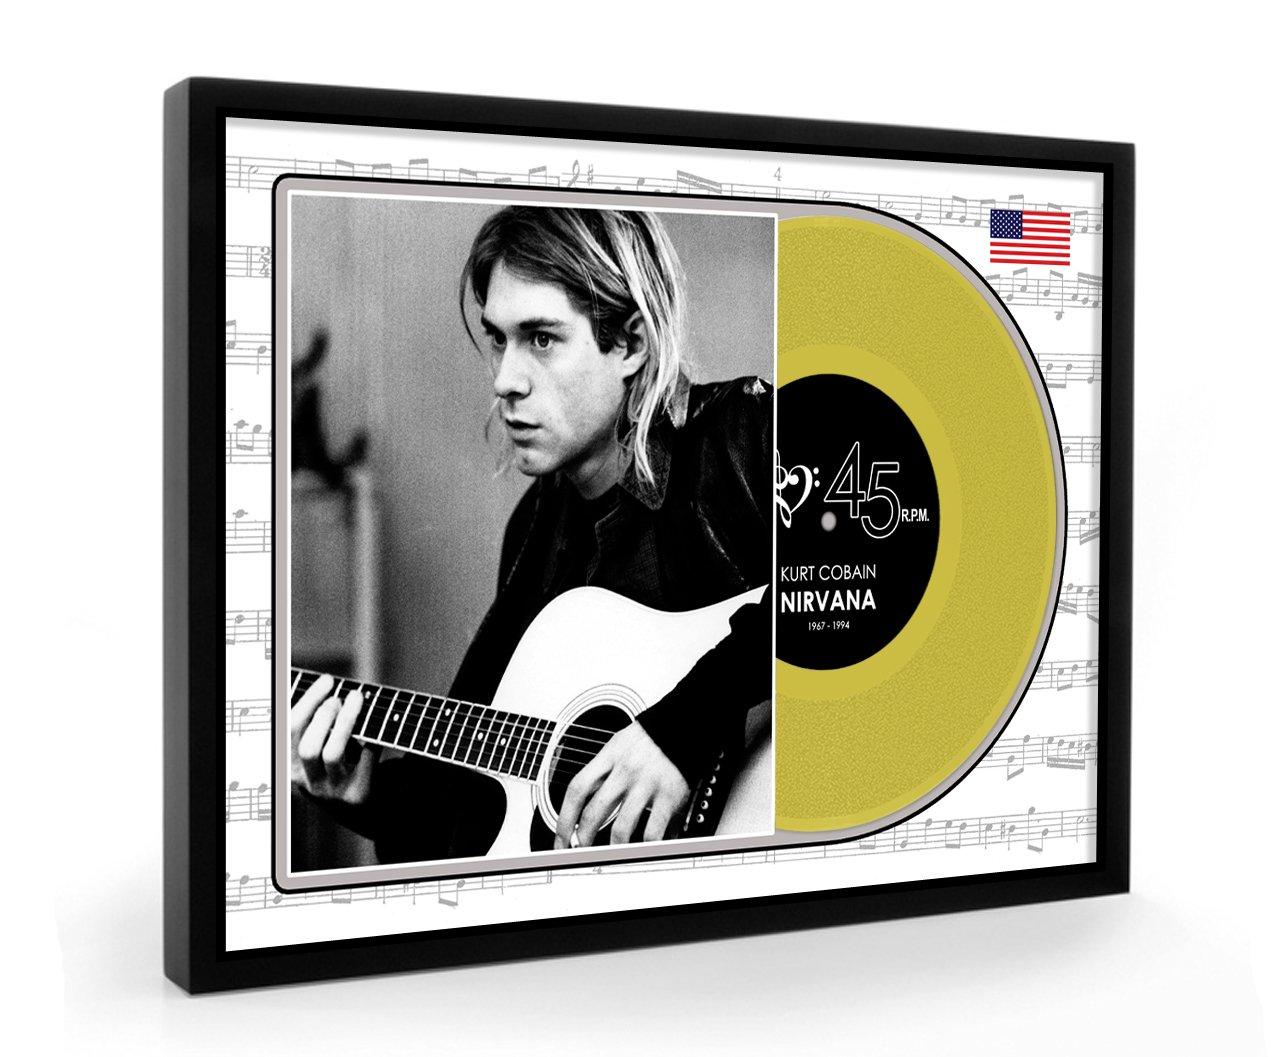 Kurt Cobain Nirvana Framed Goldene Schallplatte Display Premium ...